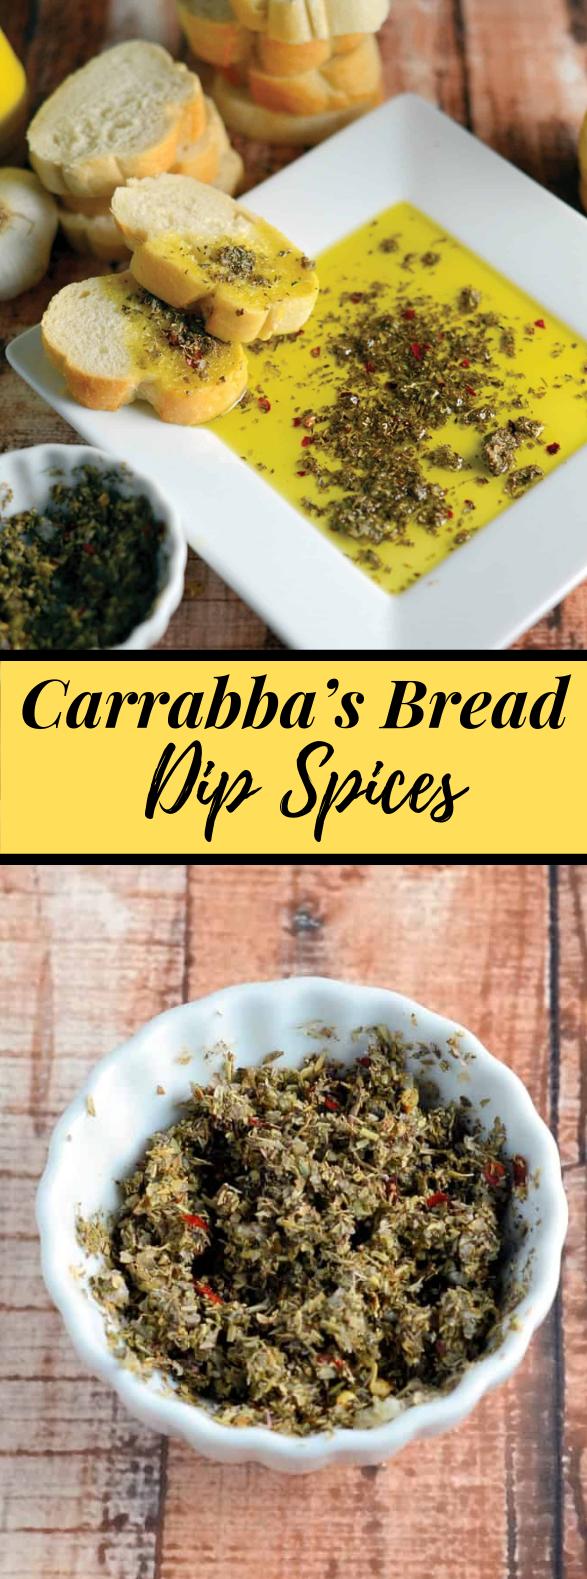 Carrabba's Olive Oil Bread Dip #meal #recipe